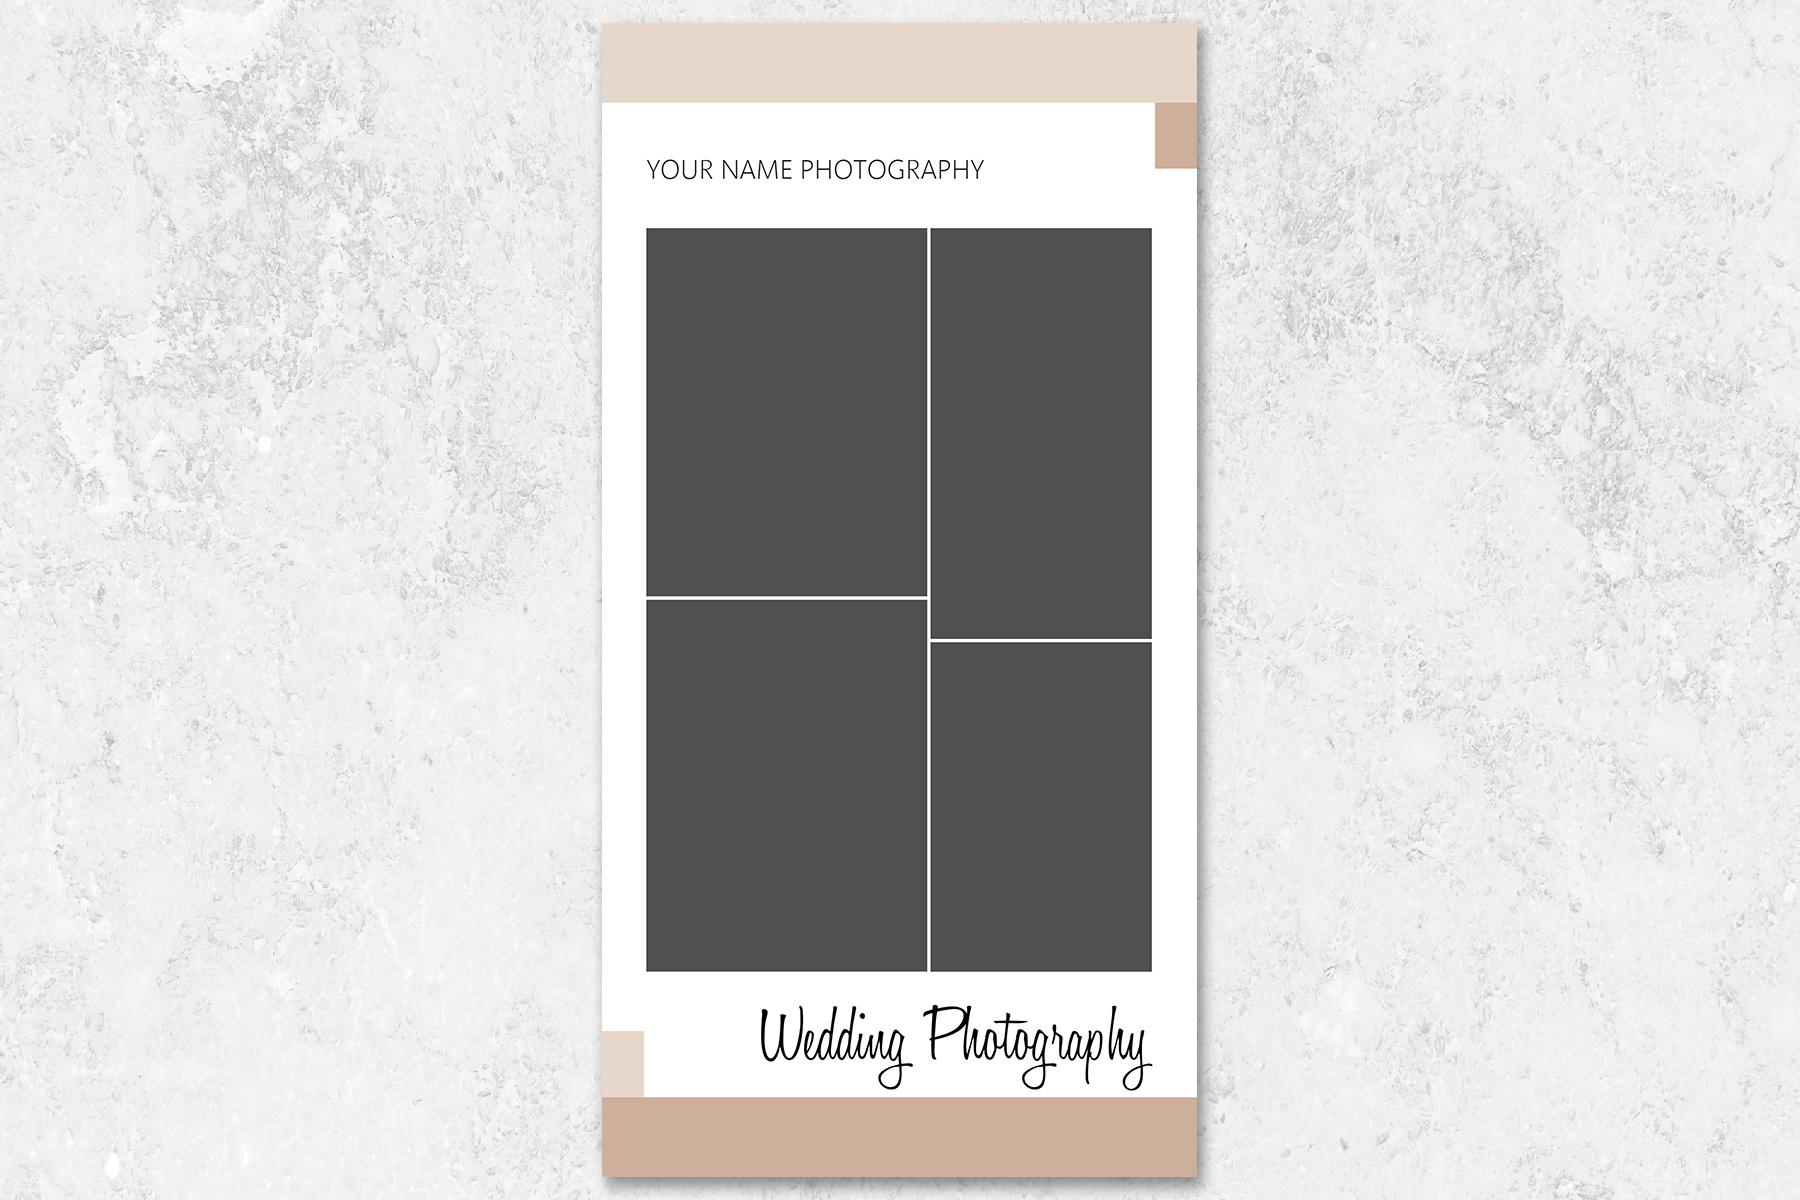 Wedding Photography Rack Card Template example image 3